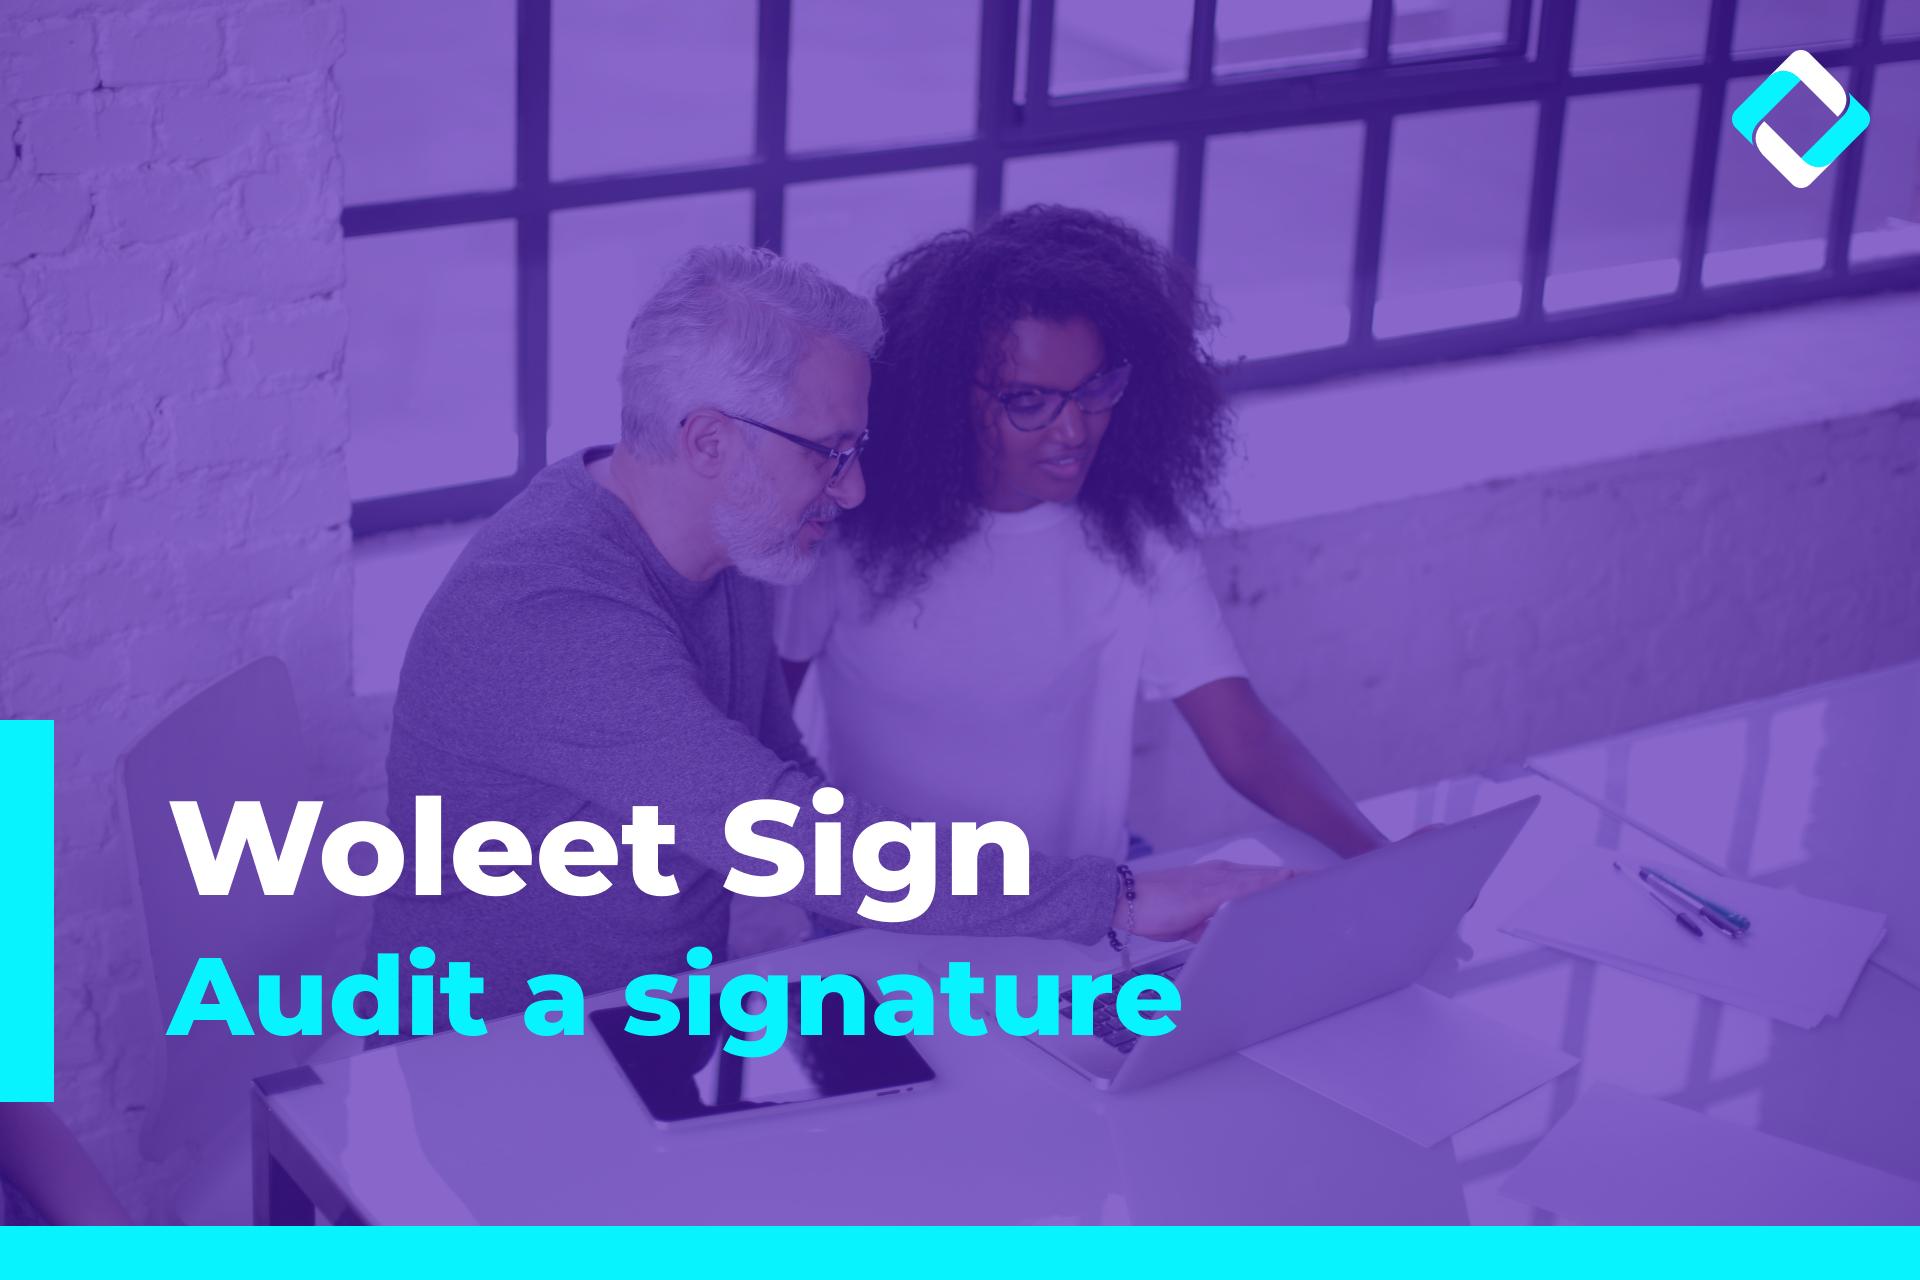 Audit a signature